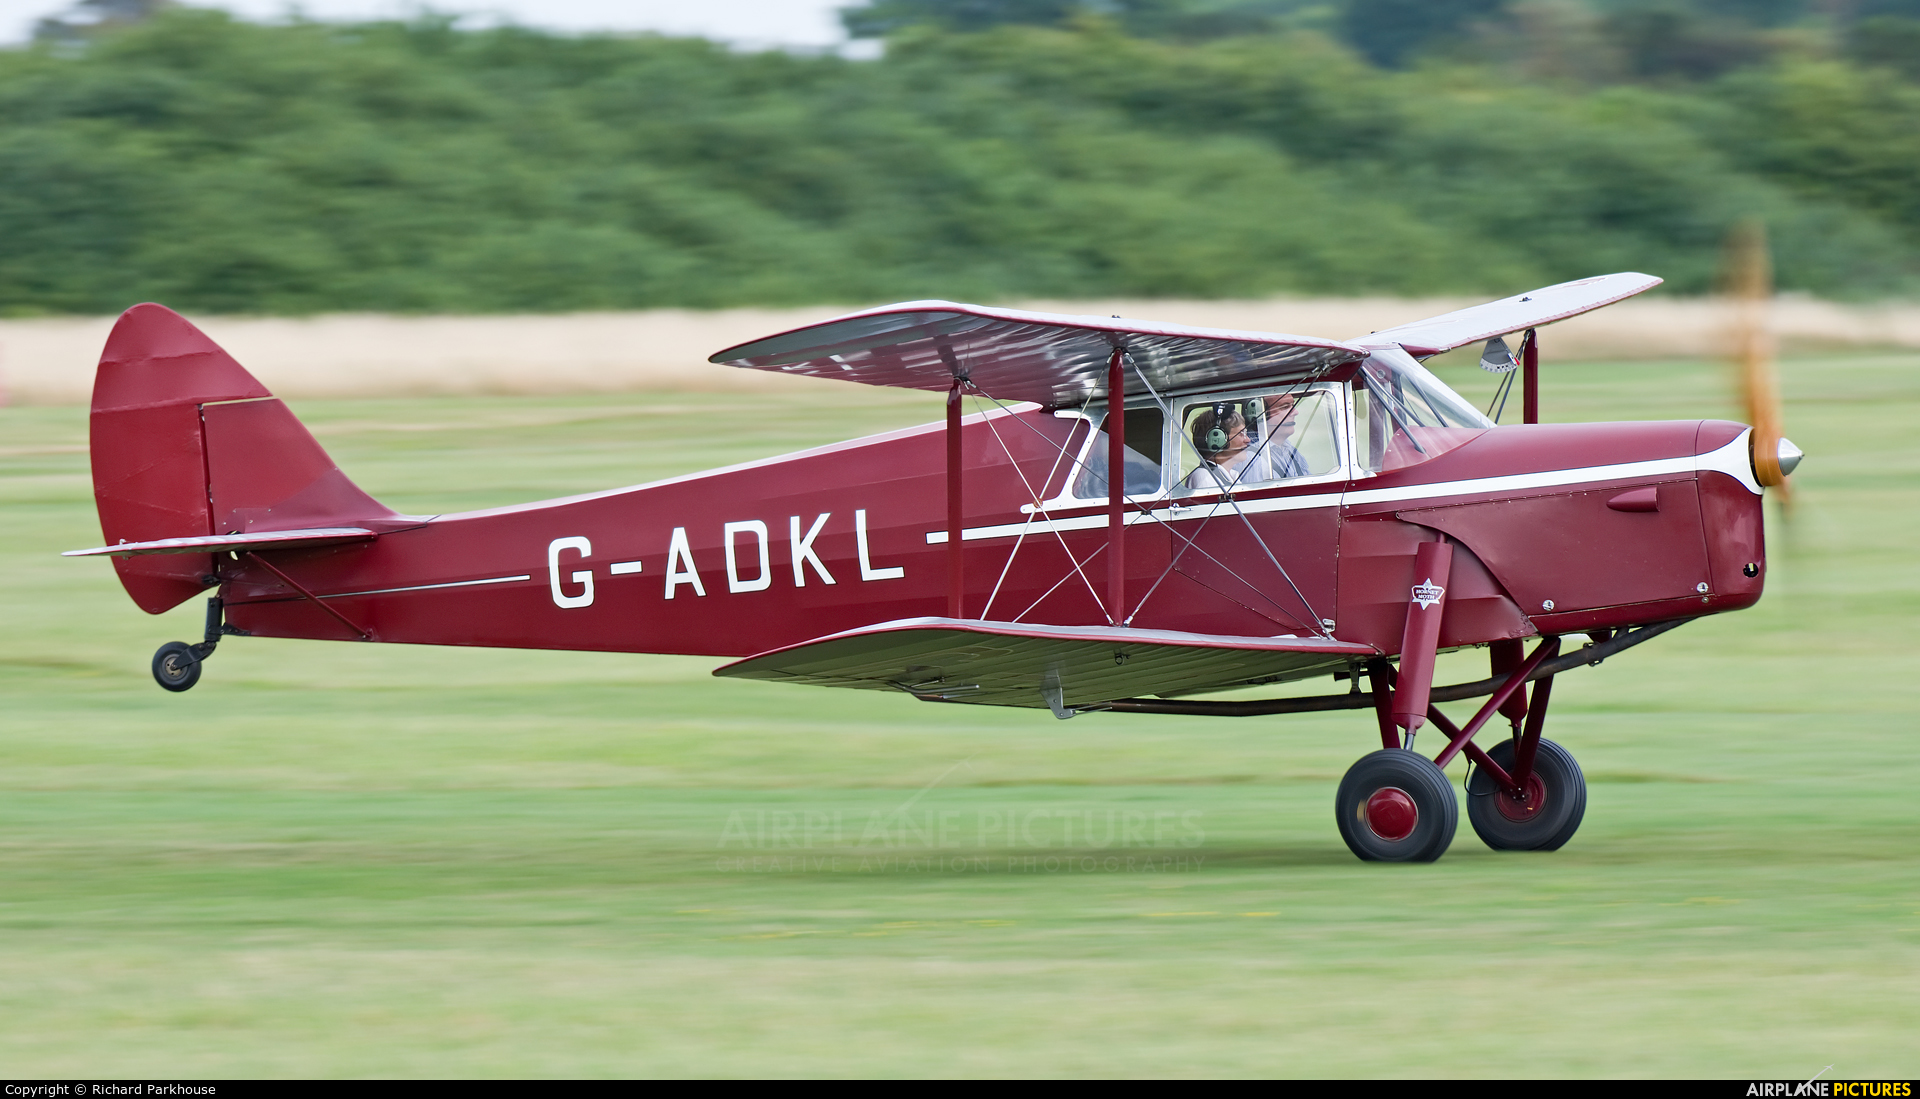 Private G-ADKL aircraft at Old Warden